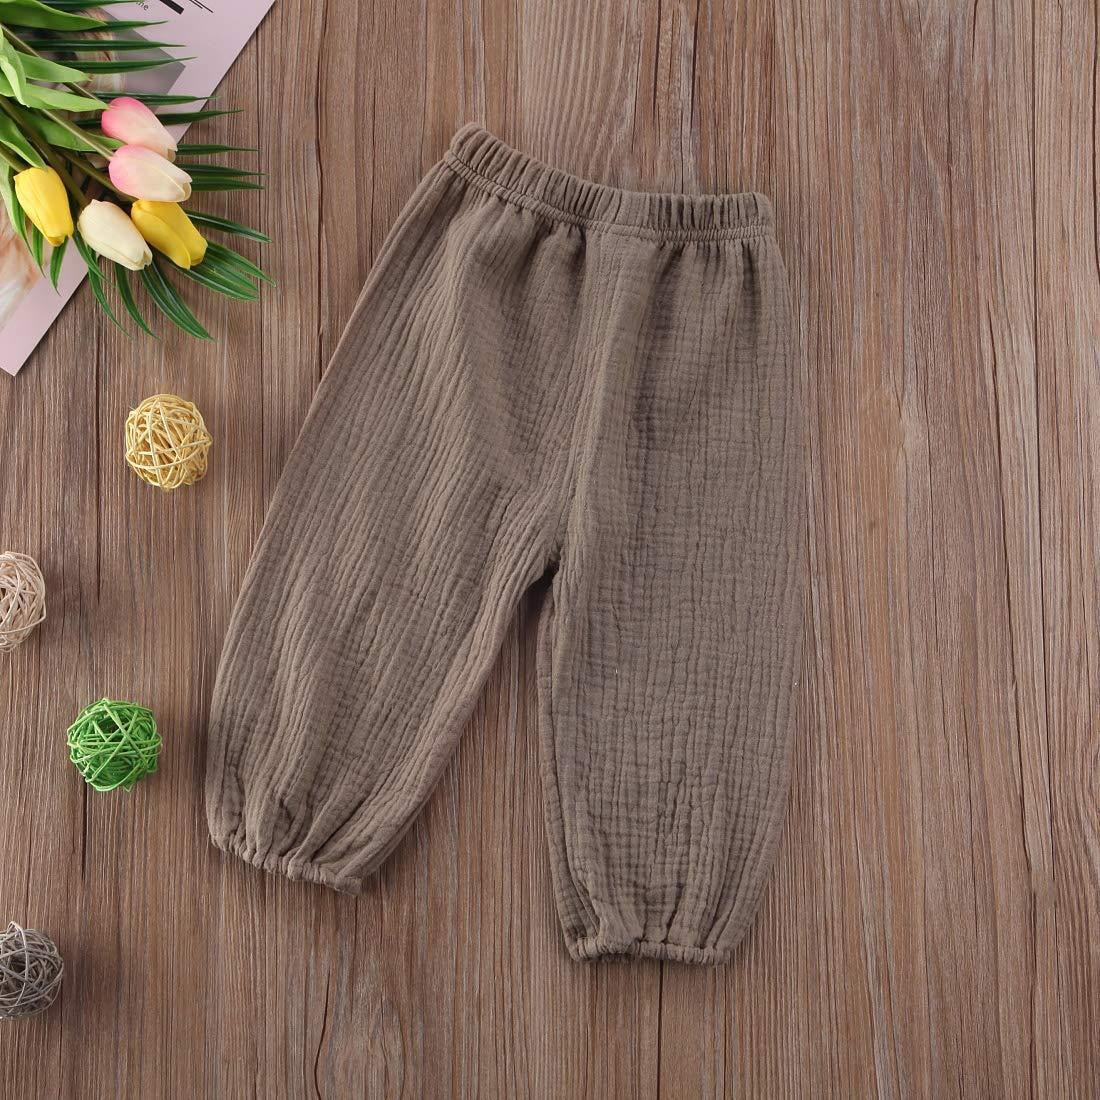 Frecoccialo Unisex Baby Hosen Kinder Jungen M/ädchen Bloomers Pumphose Baumwolle Harem Hosen Fr/ühling Herbst Kleidung